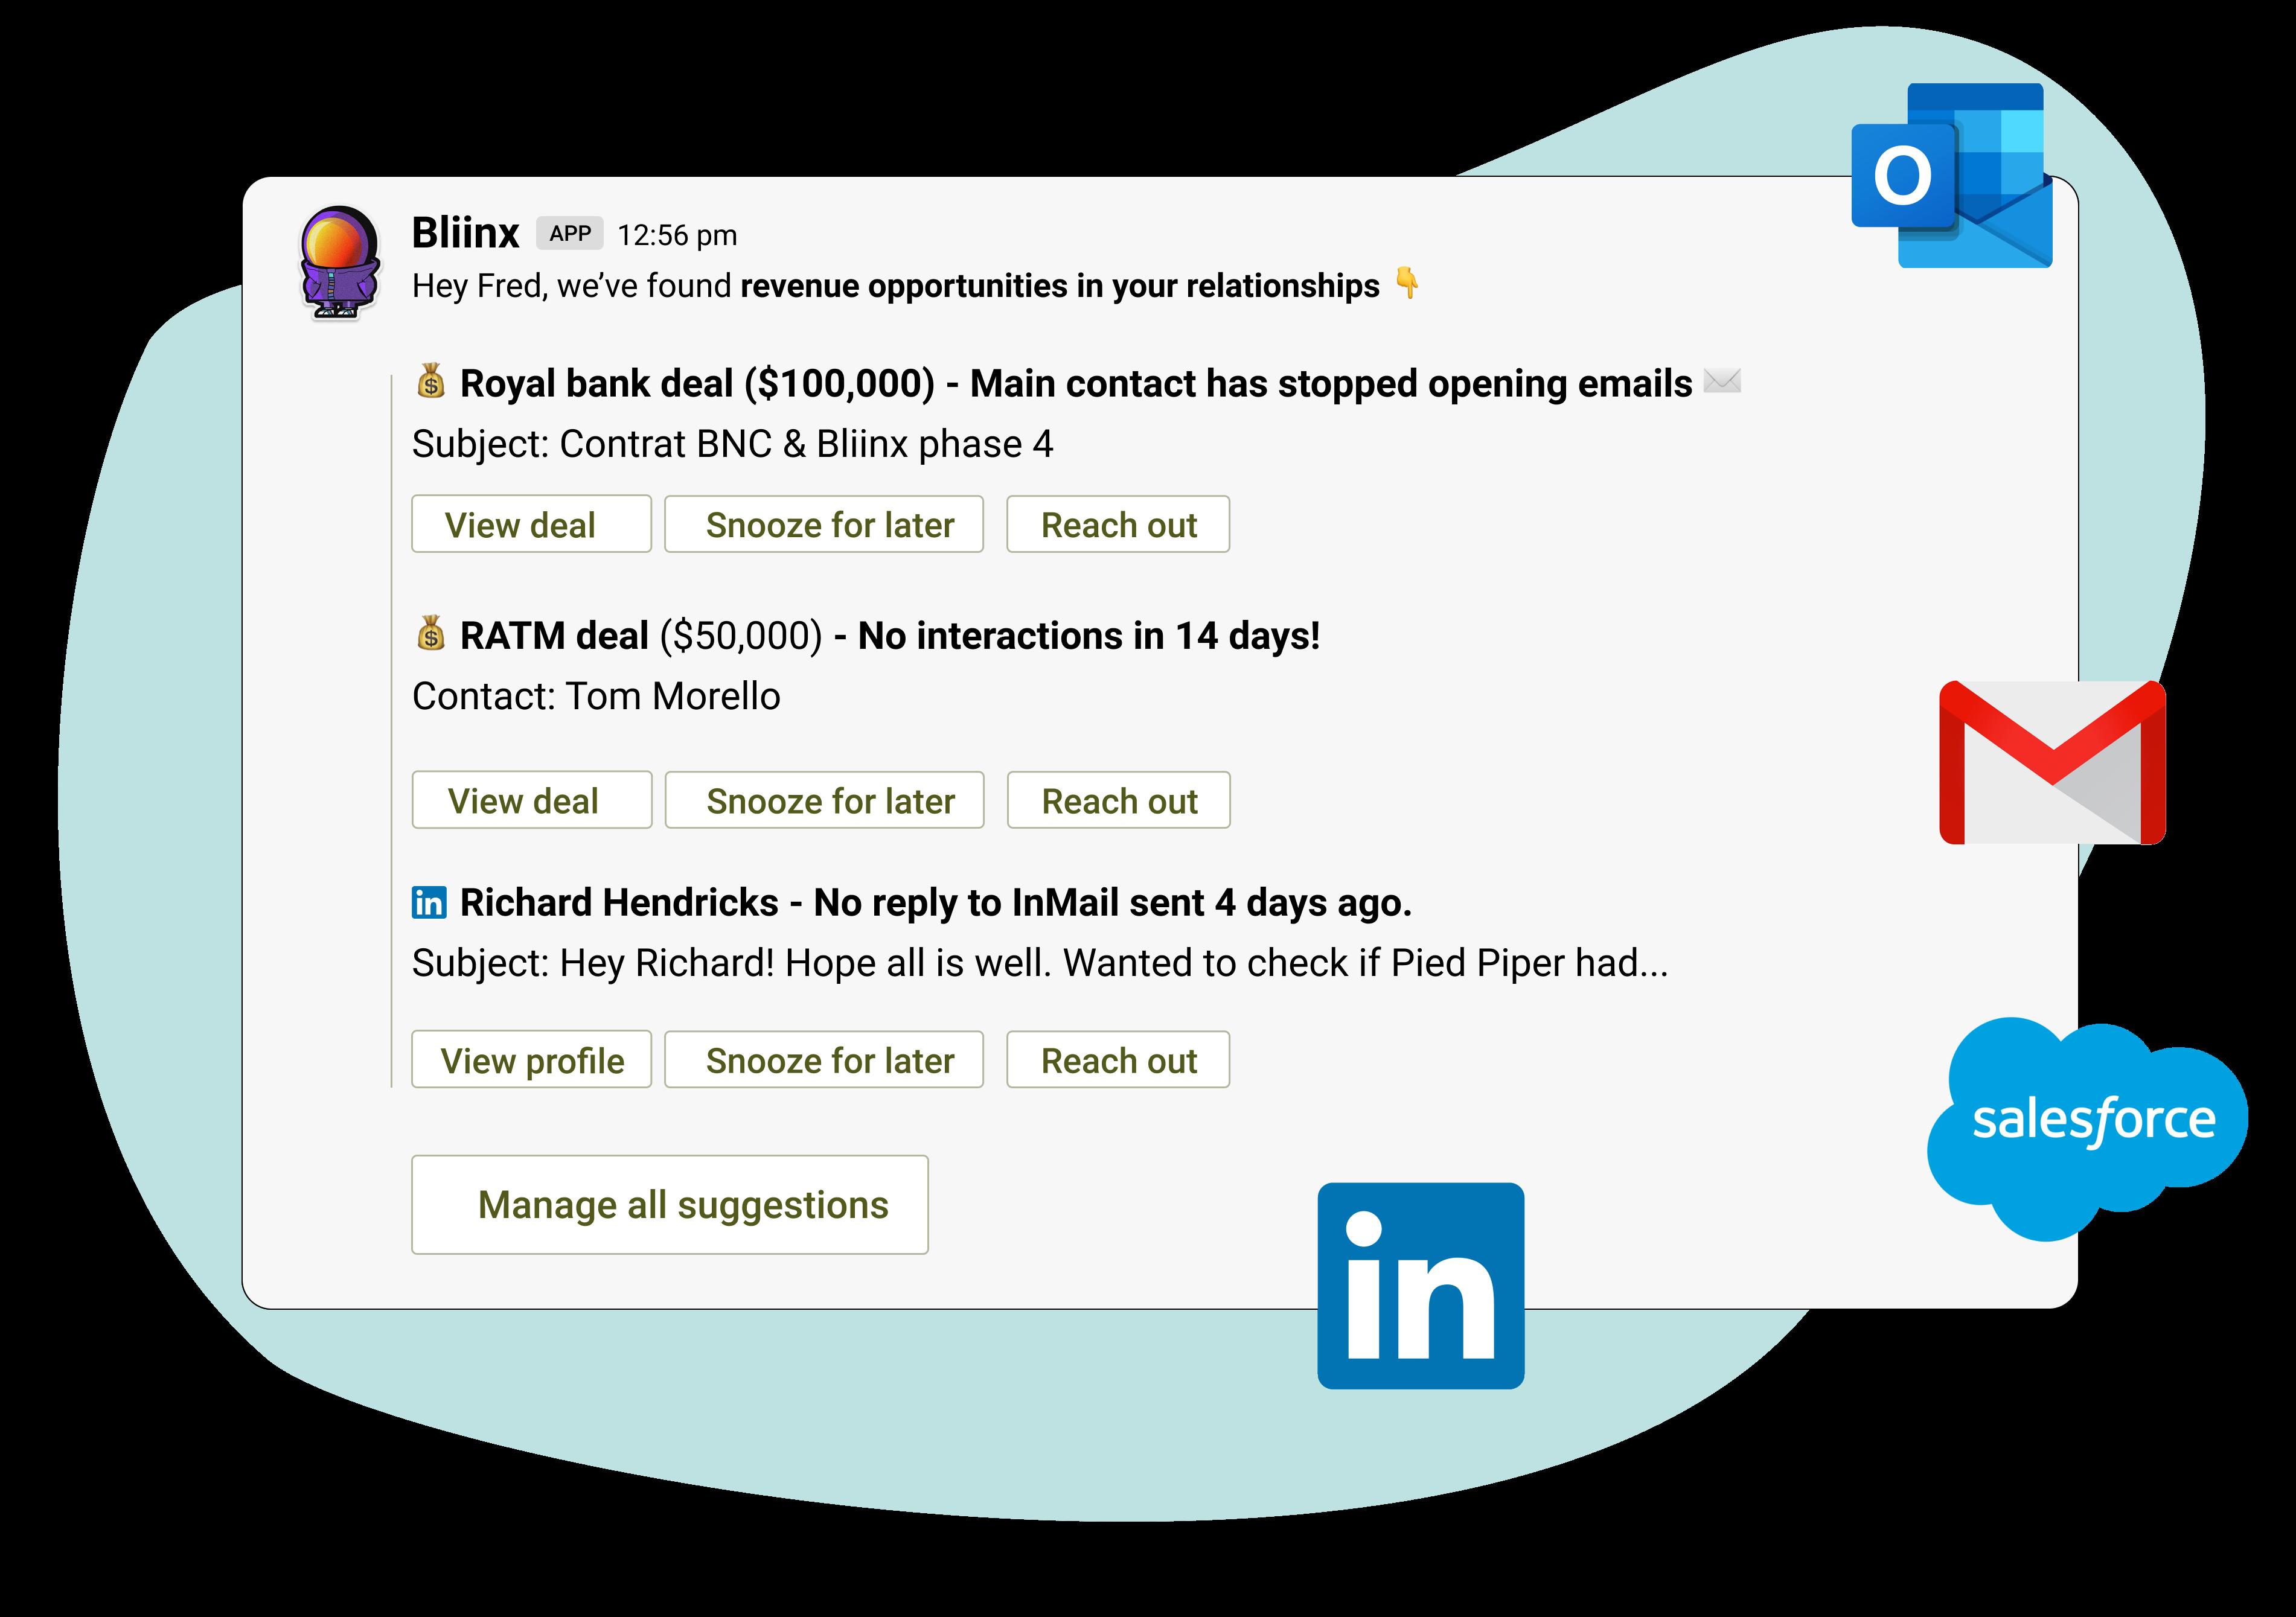 Blindspot notification in Slack with Salesforce